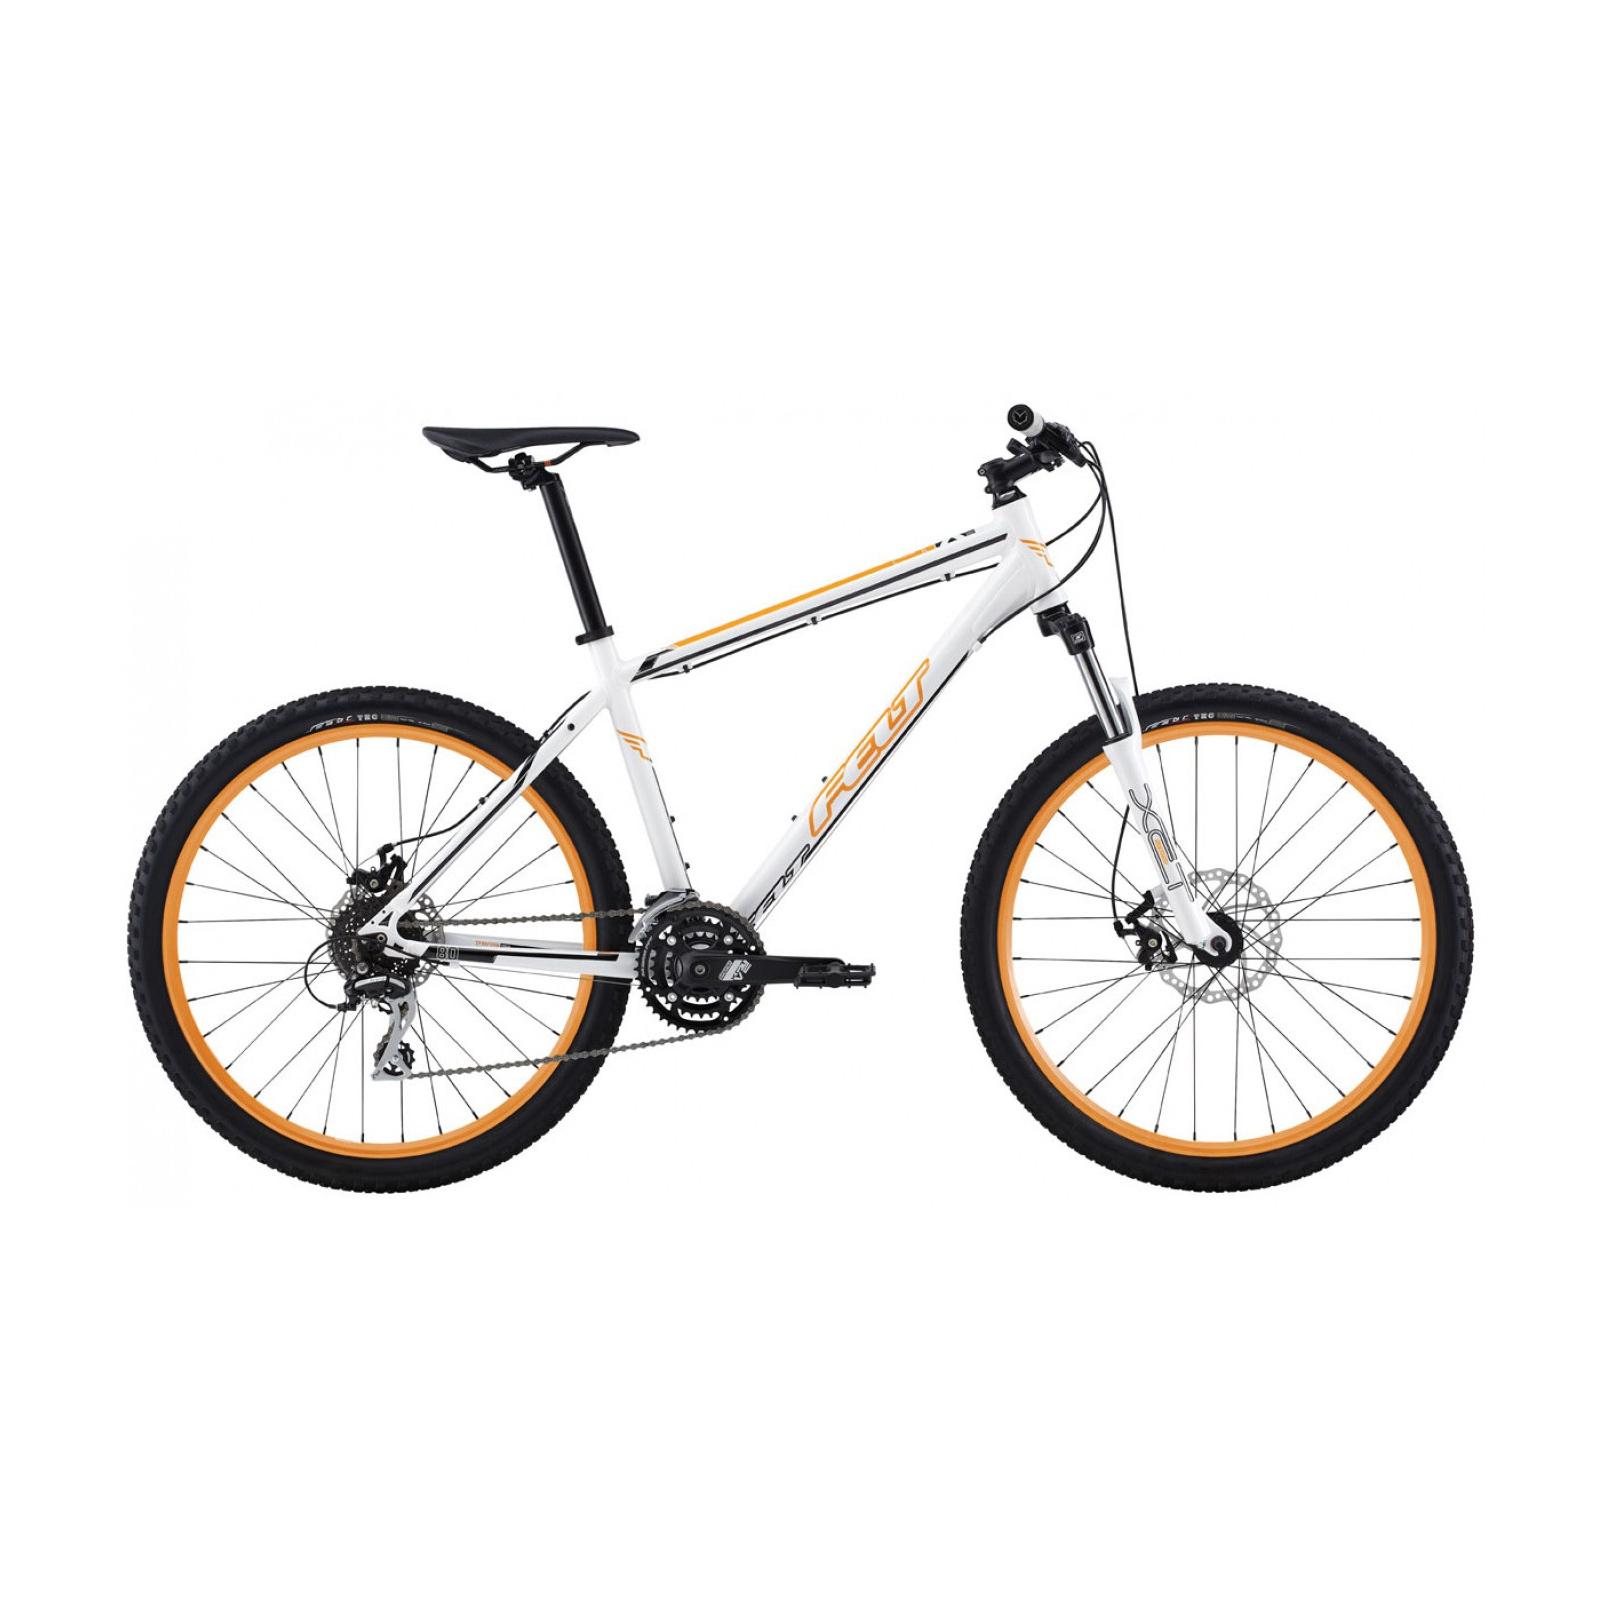 "Велосипед Felt MTB SIX 80 M white (black/orange) 18"" (8044 06602)"